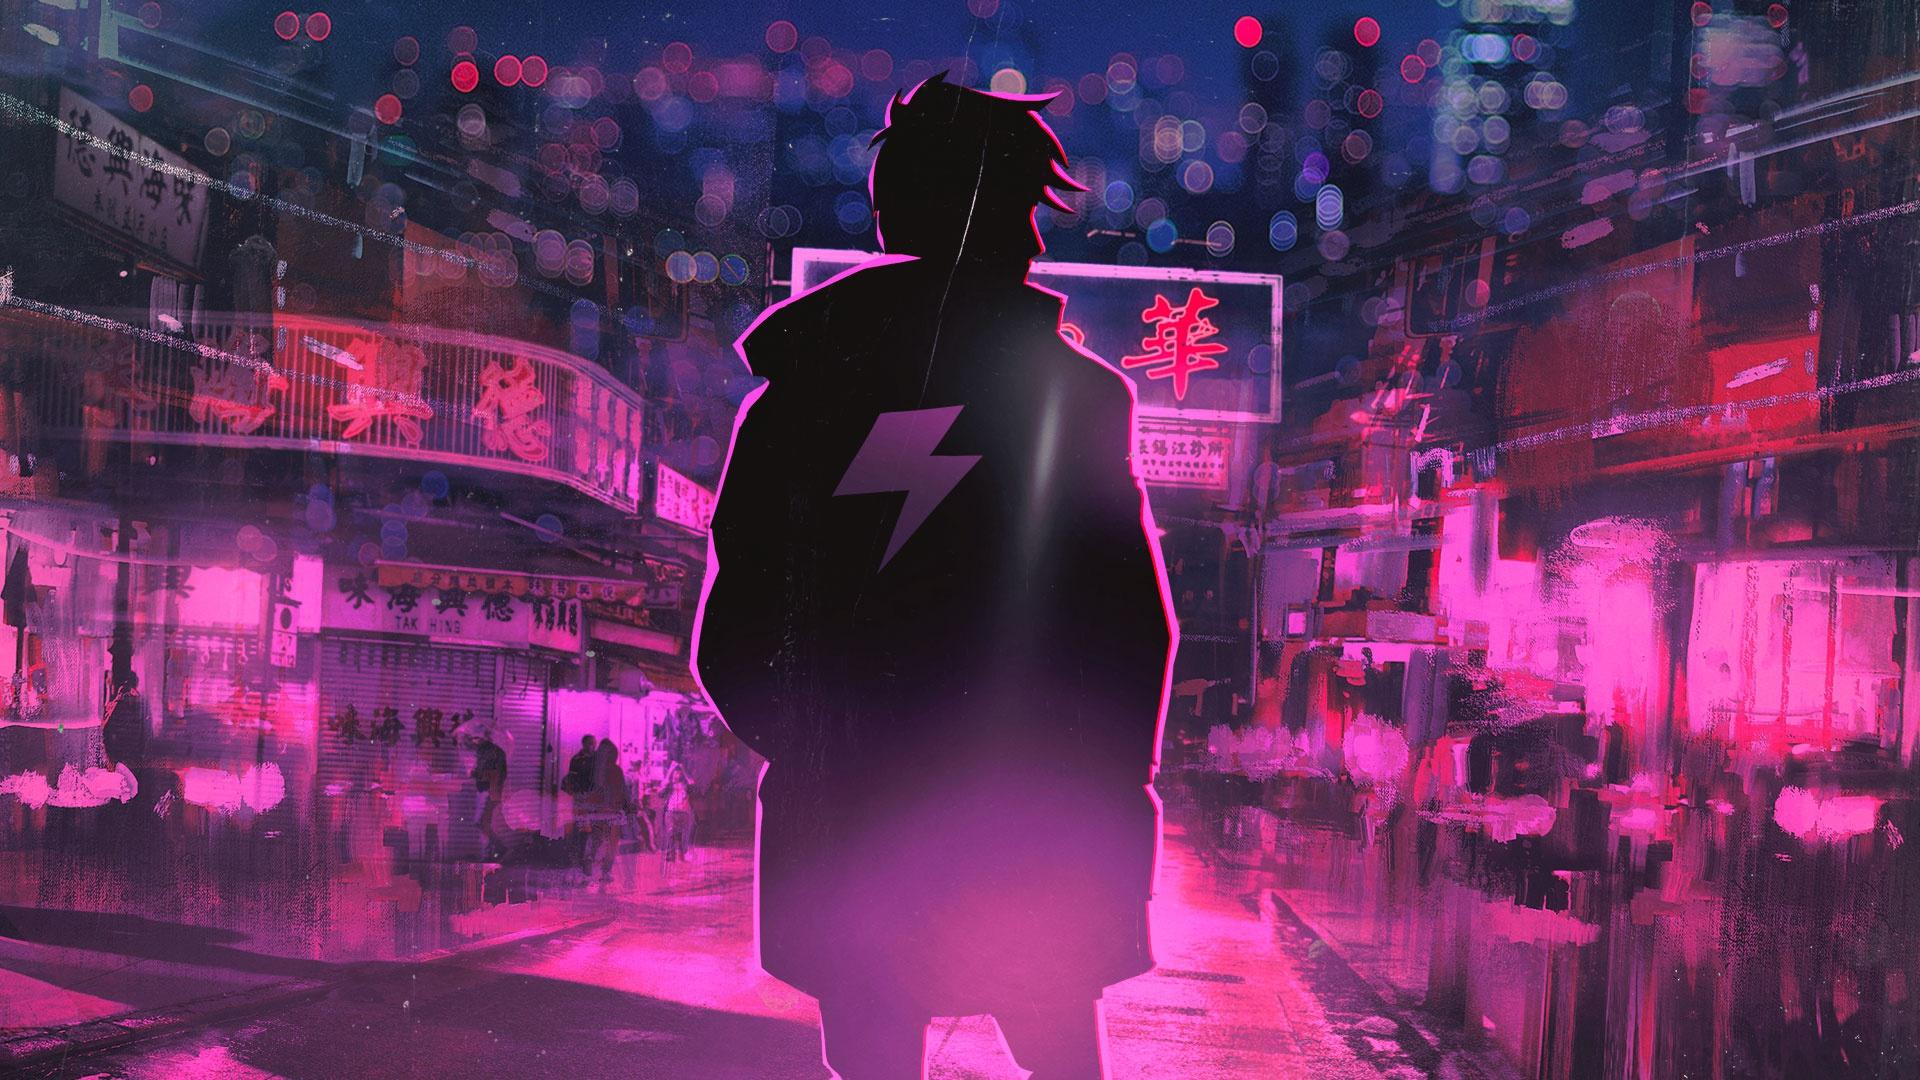 Wallpaper Neon Berwarna Merah Muda Karya Seni Seni Digital Terry Zhong 1920x1080 Wallpapermaniac 1720157 Hd Wallpapers Wallhere